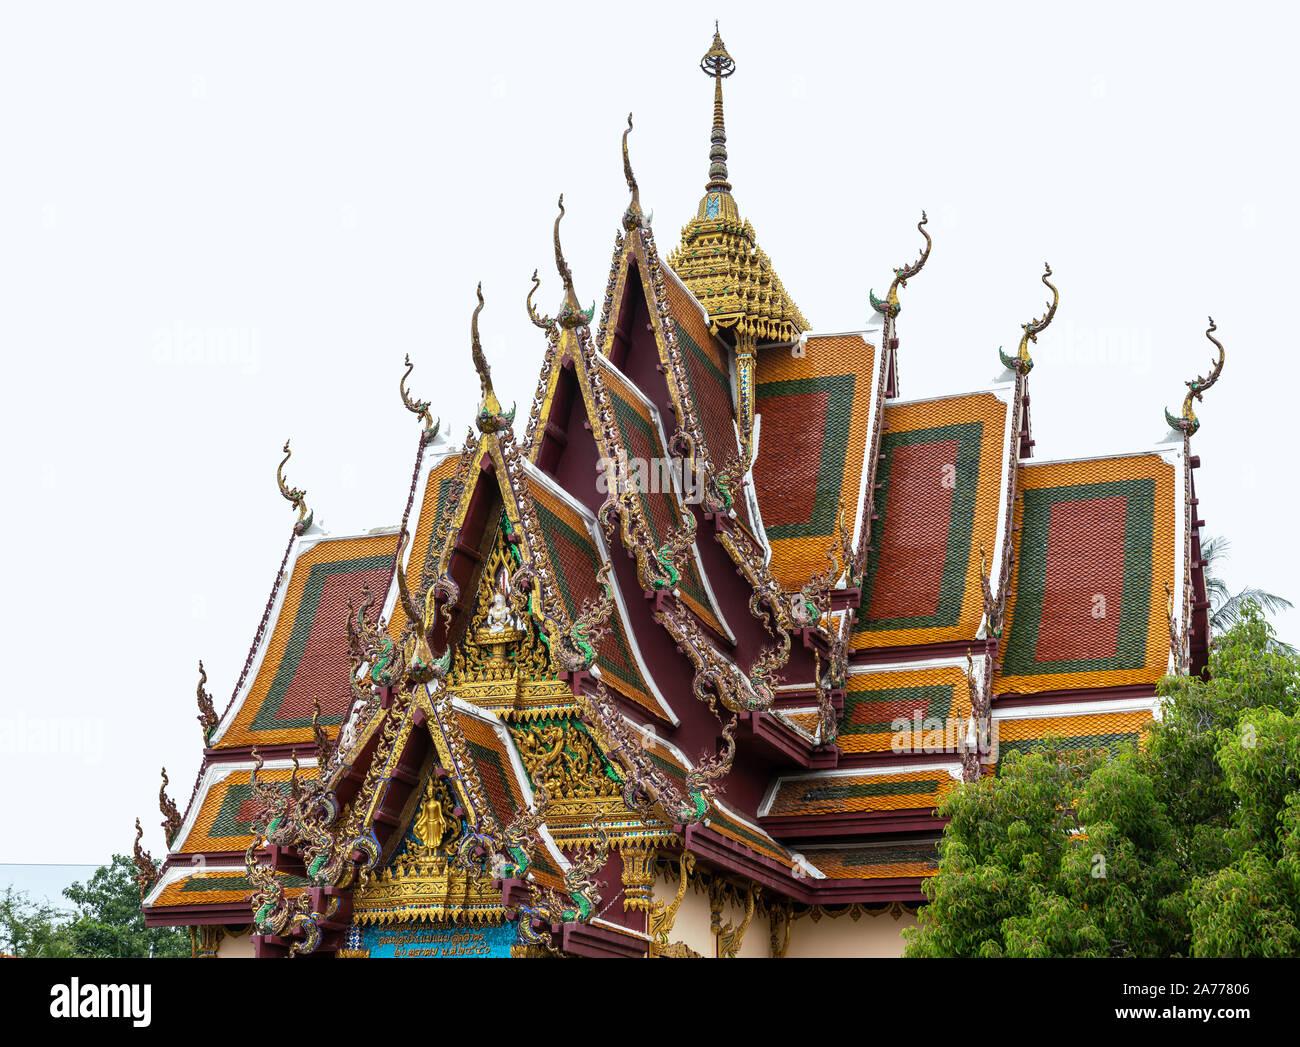 Ko Samui Island, Thailand - March 18, 2019: Wat Laem Suwannaram Chinese Buddhist Temple. Elaborately decorated multi-leveled roof structure with gold, Stock Photo